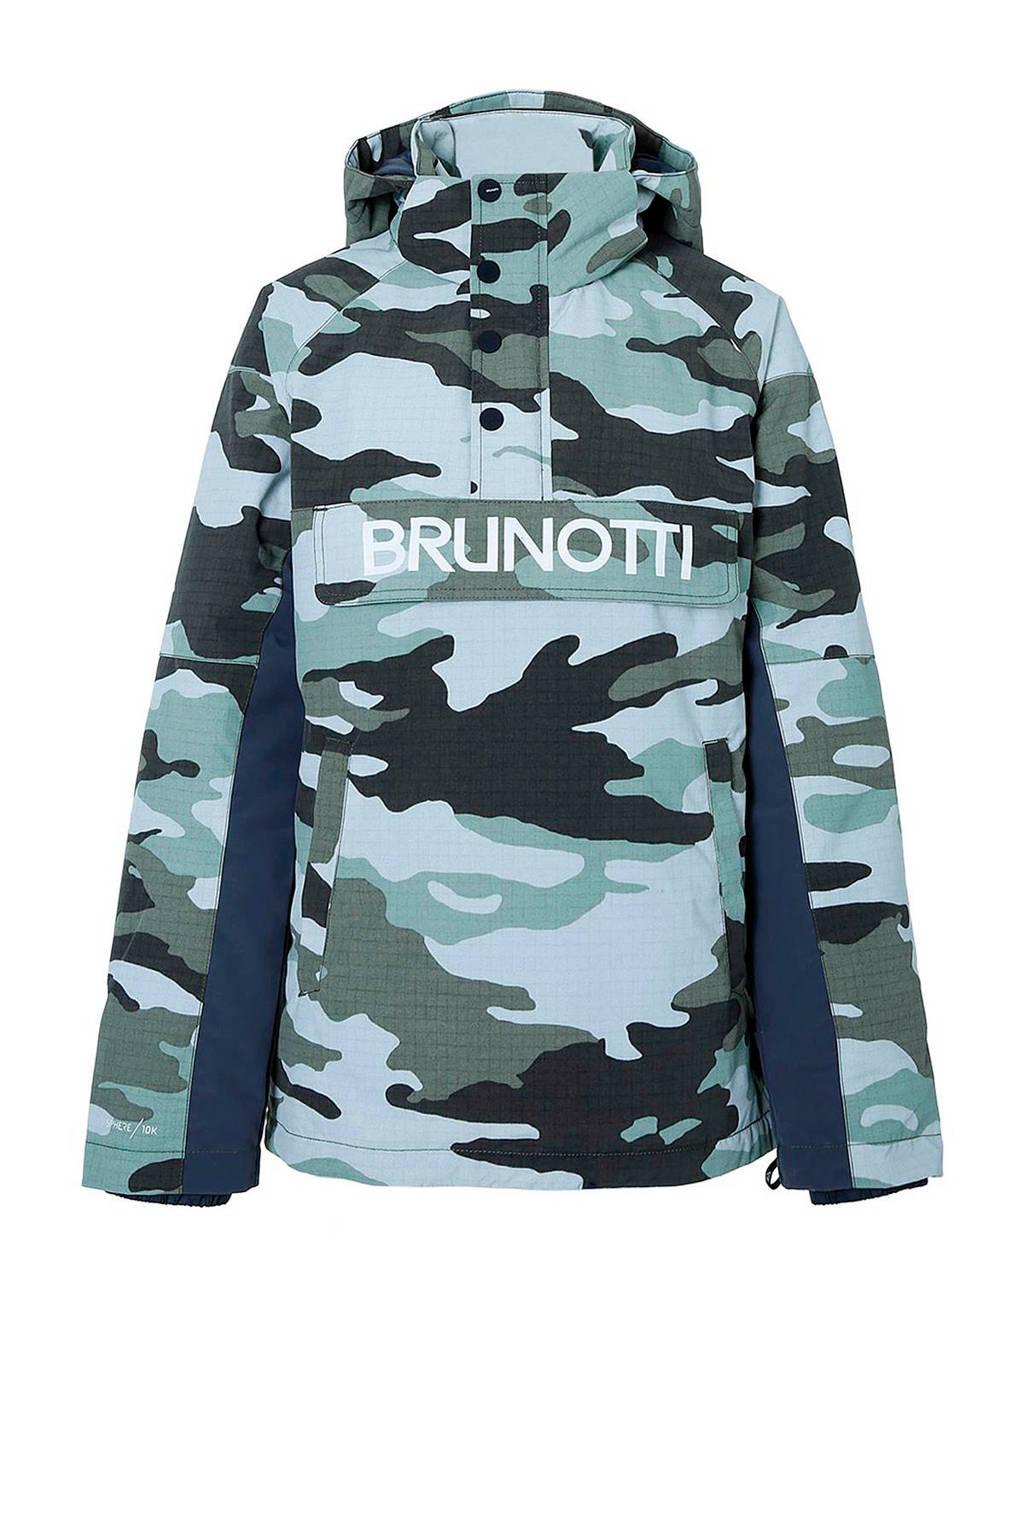 Brunotti ski-anorak Kingers groen camouflage, Groen/wit/grijs